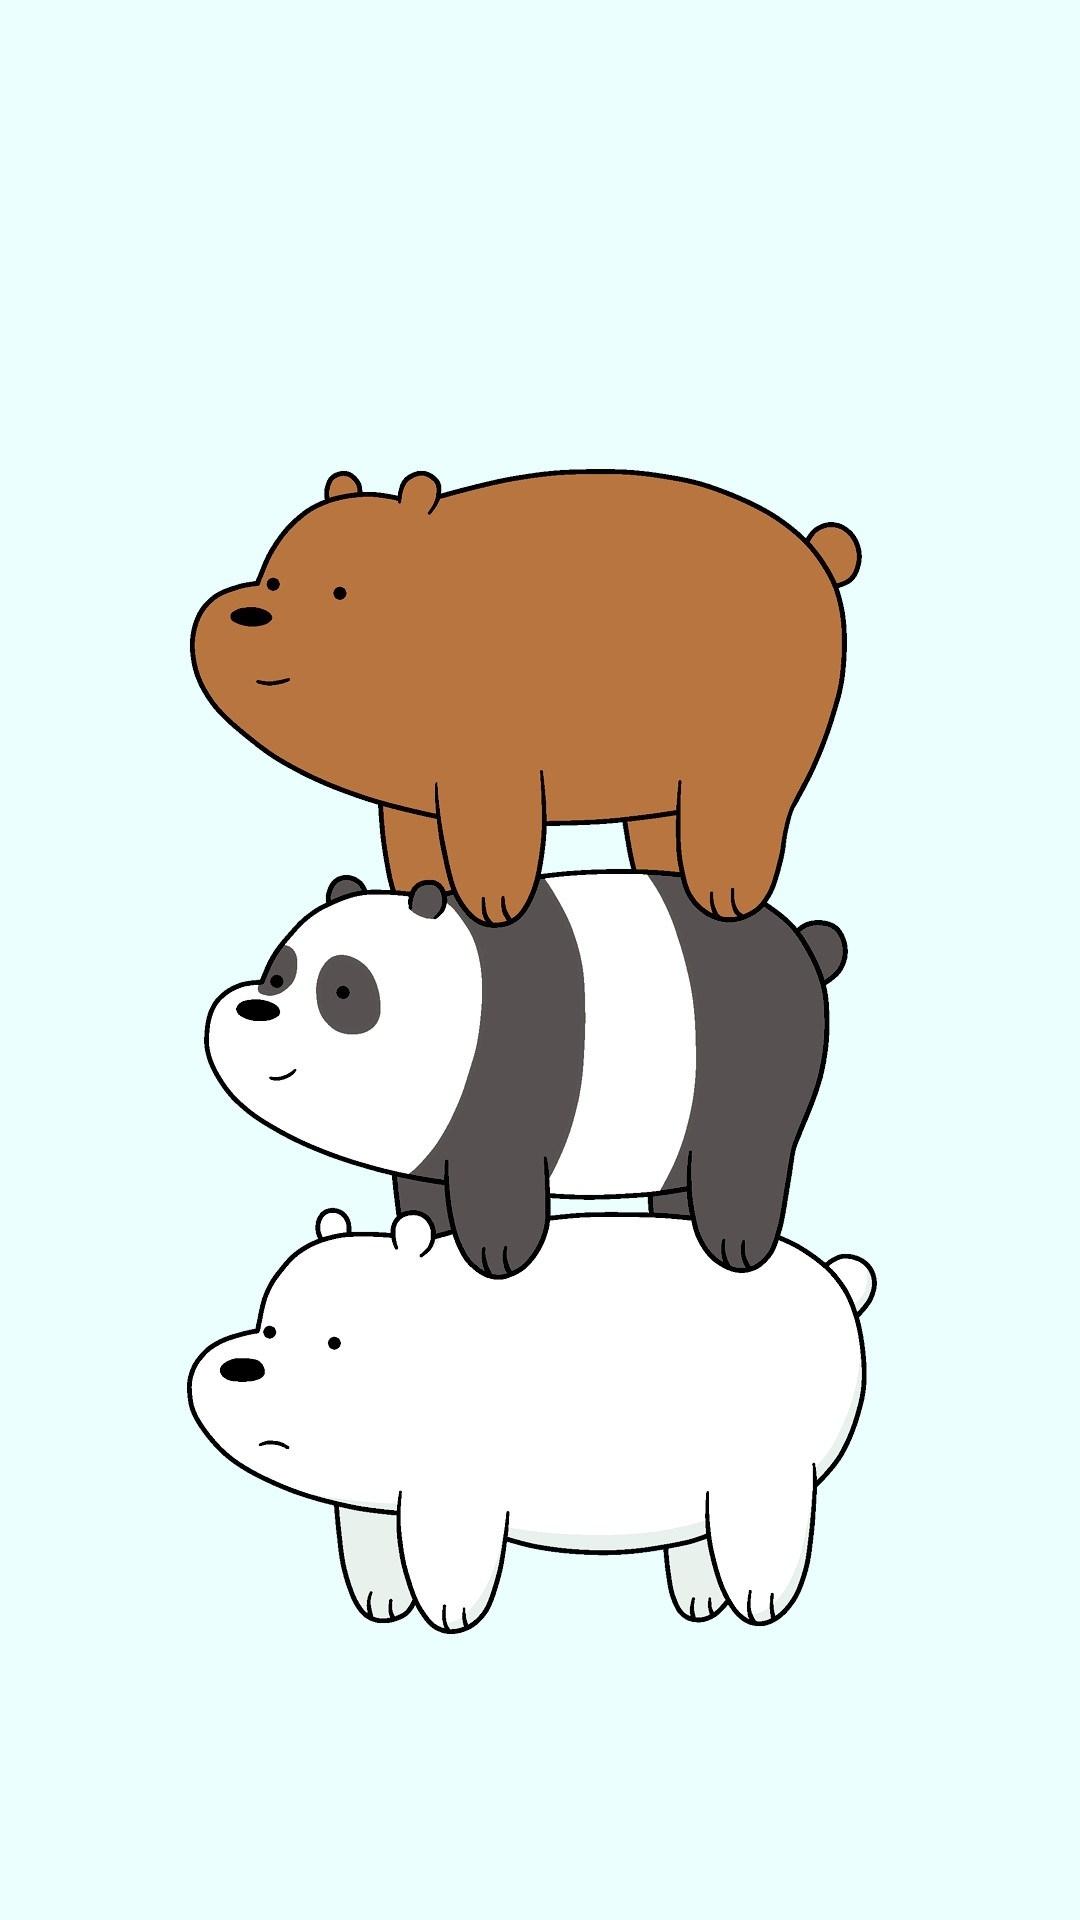 10 Top We Bare Bears Wallpaper FULL HD 1920×1080 For PC ...